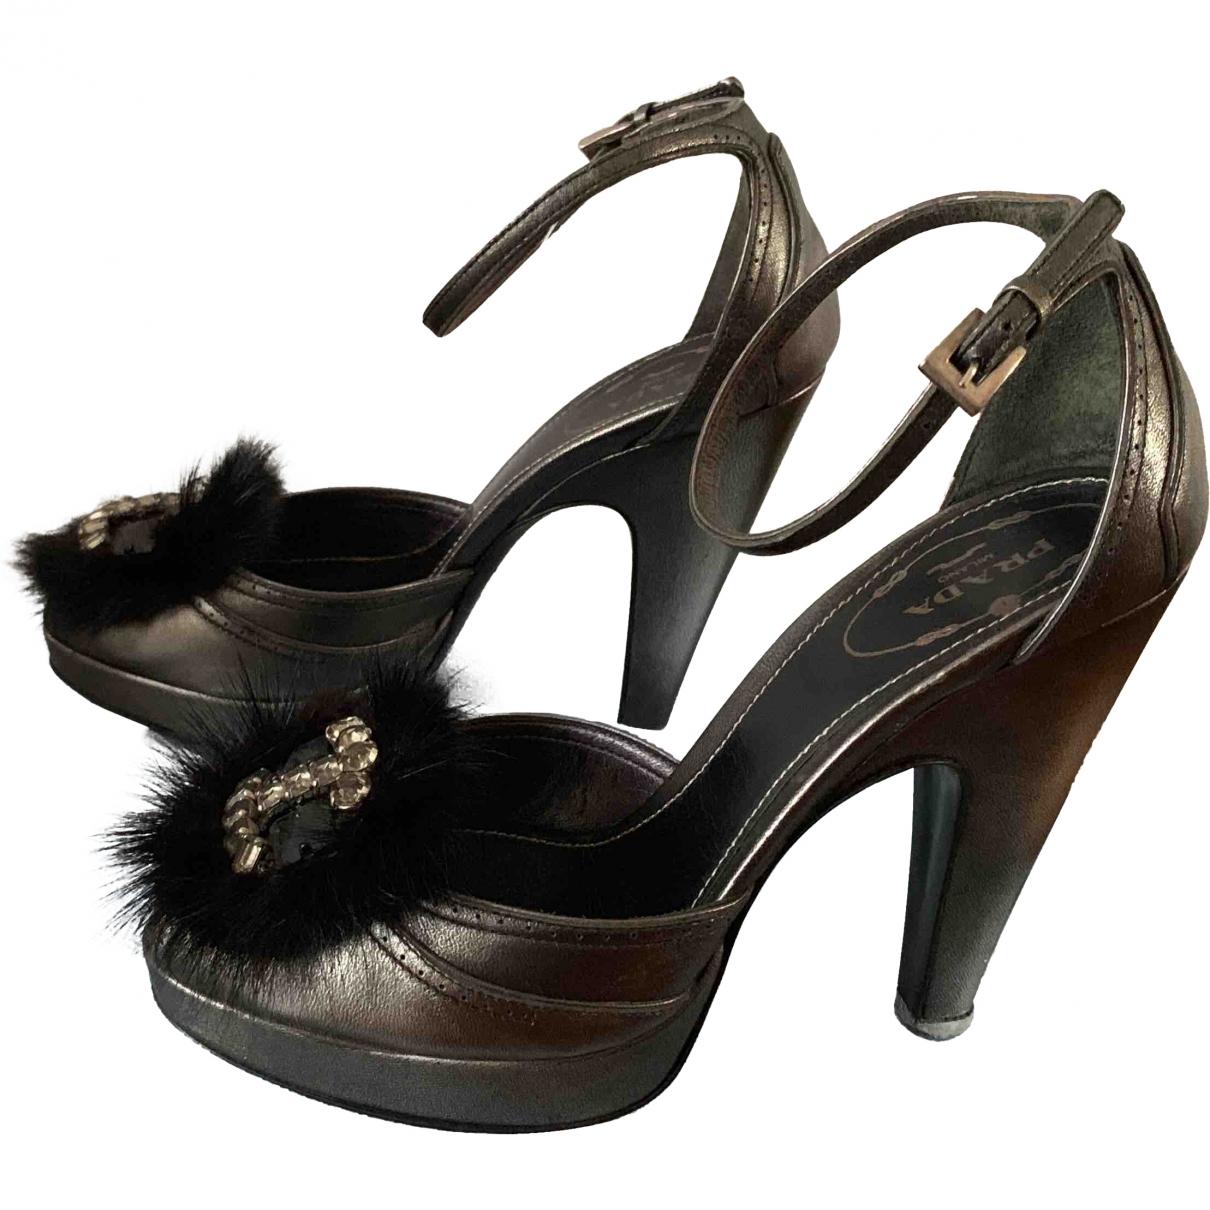 Prada \N Anthracite Leather Heels for Women 35 EU